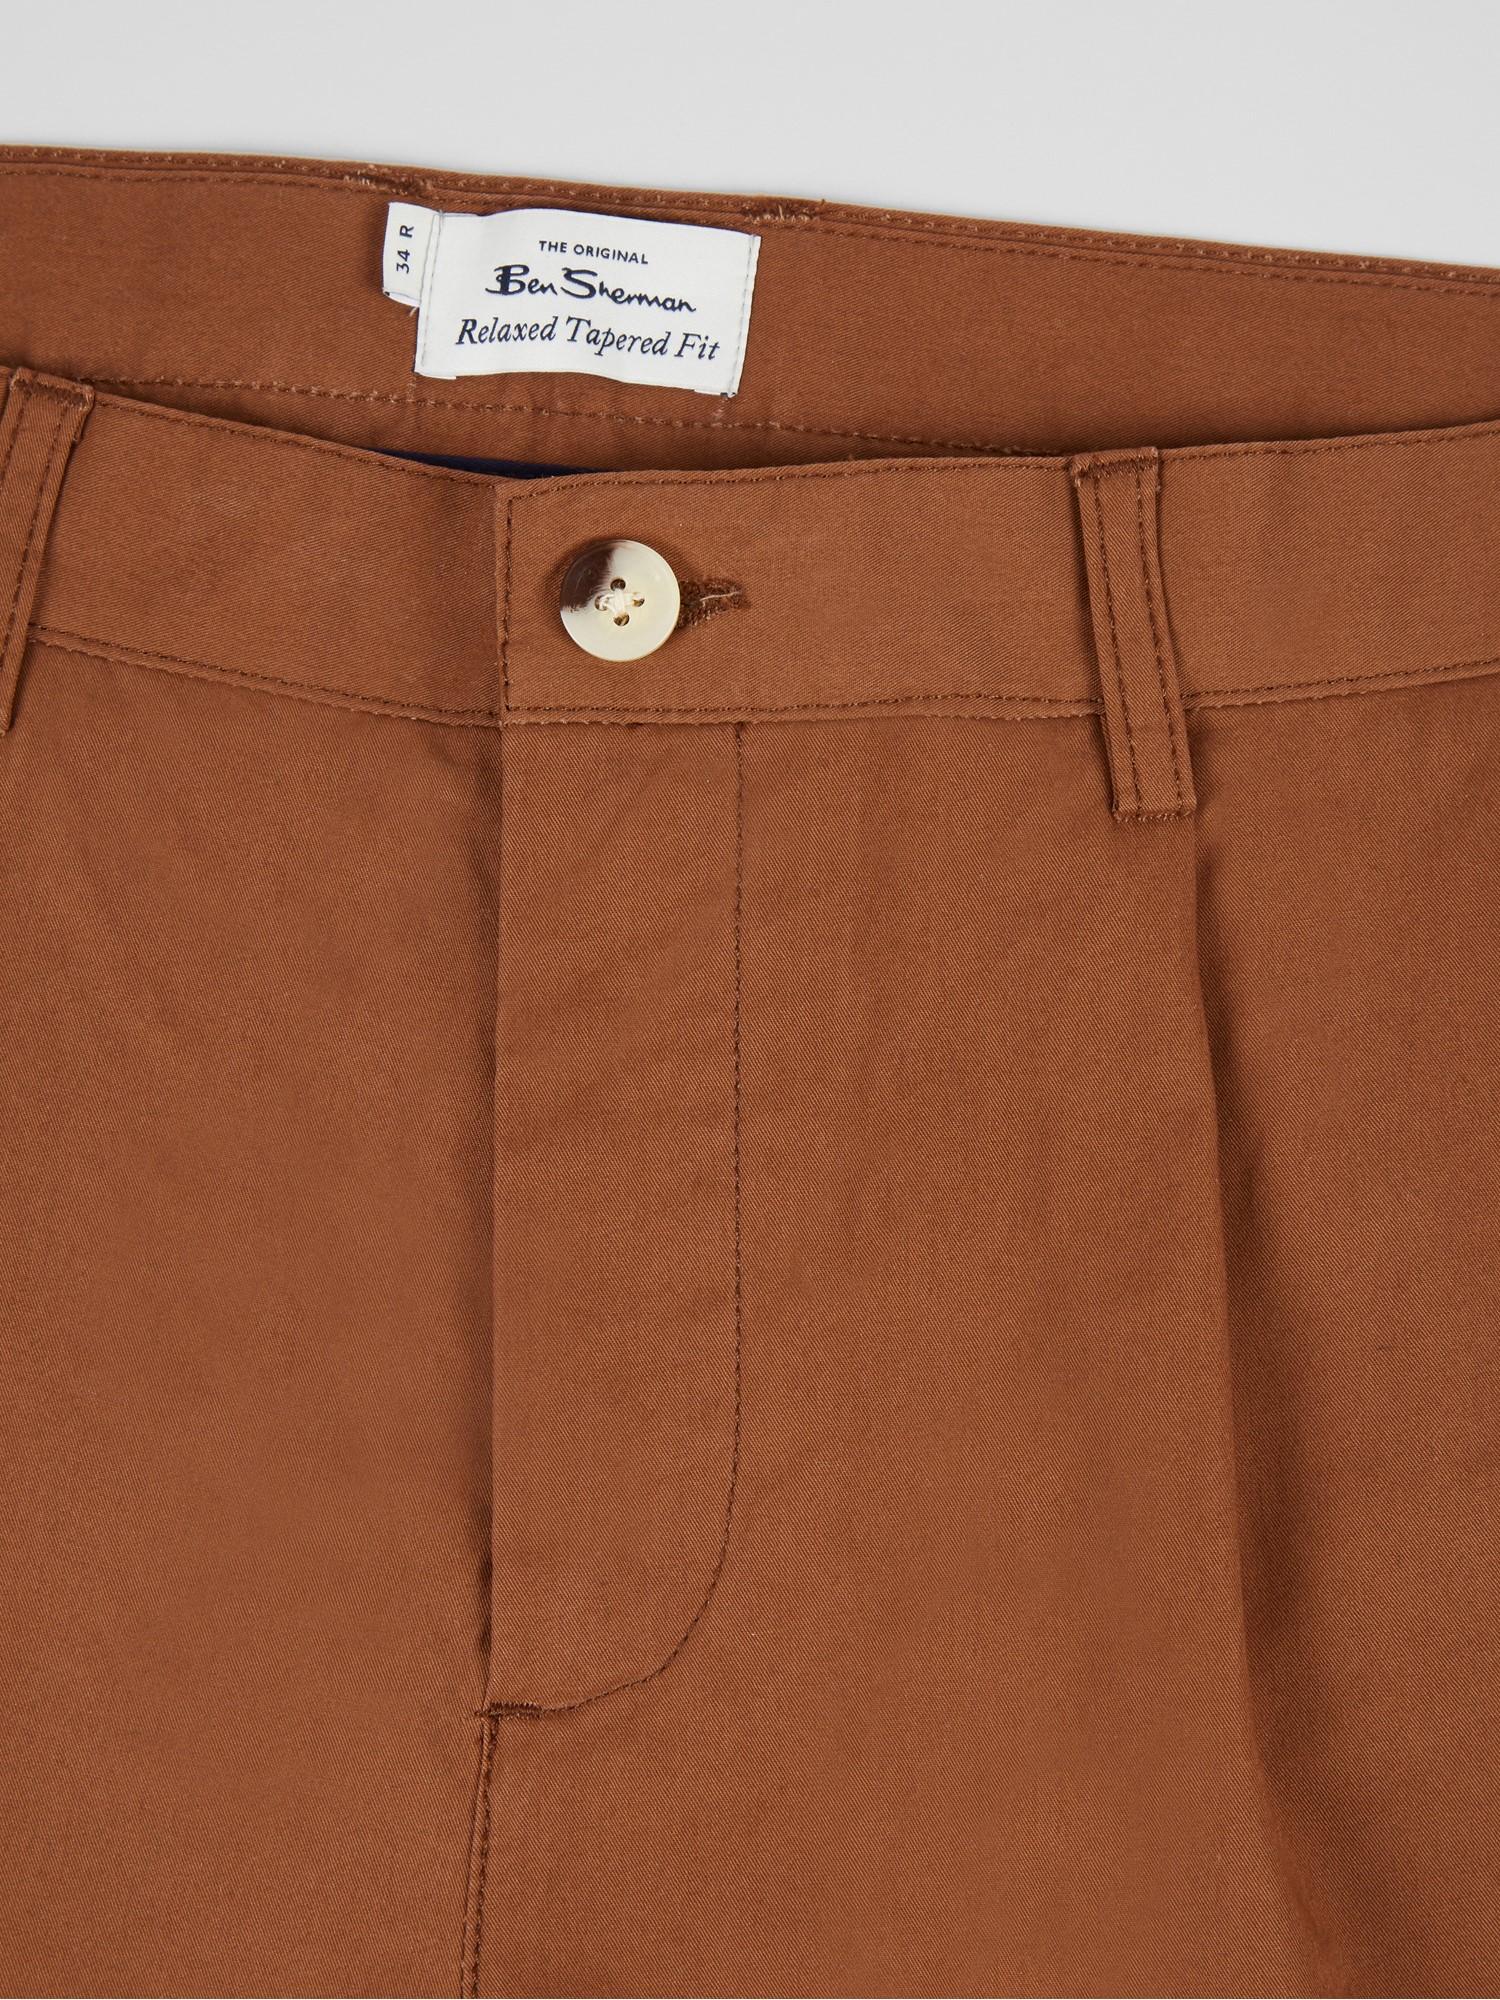 Tan Twill Relaxed Taper Pleat Trouser